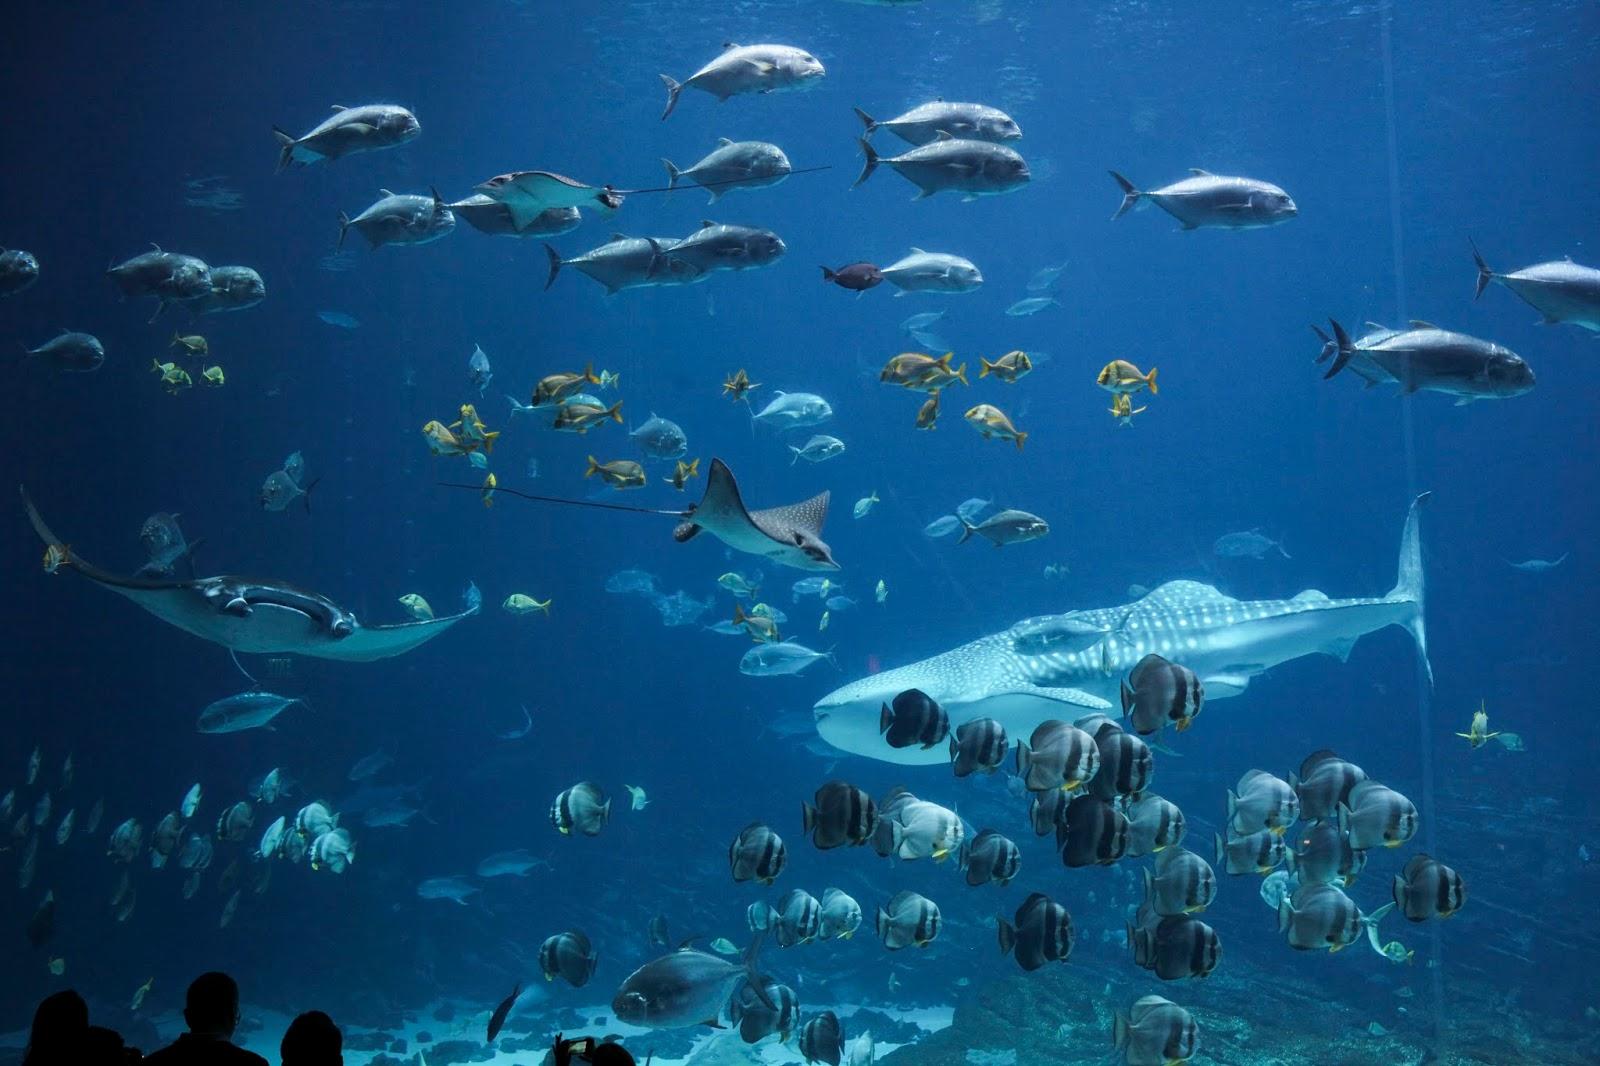 crowds are mesmerized by the massive Georgia Aquarium